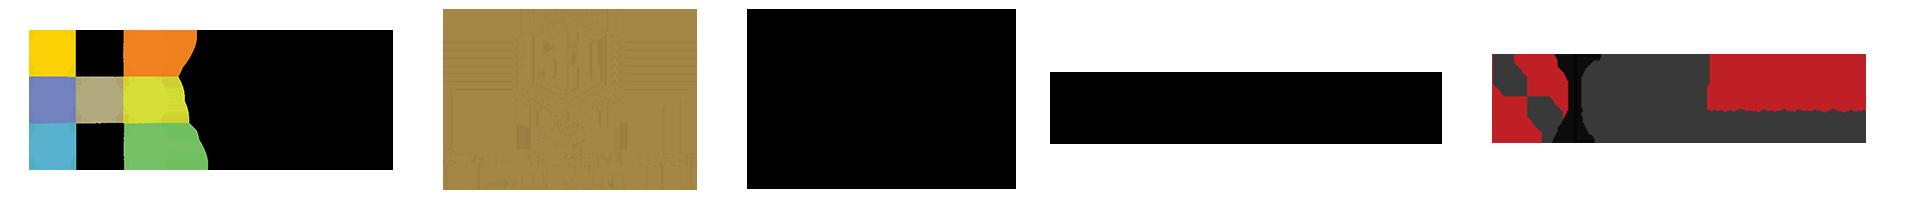 logo_partner3